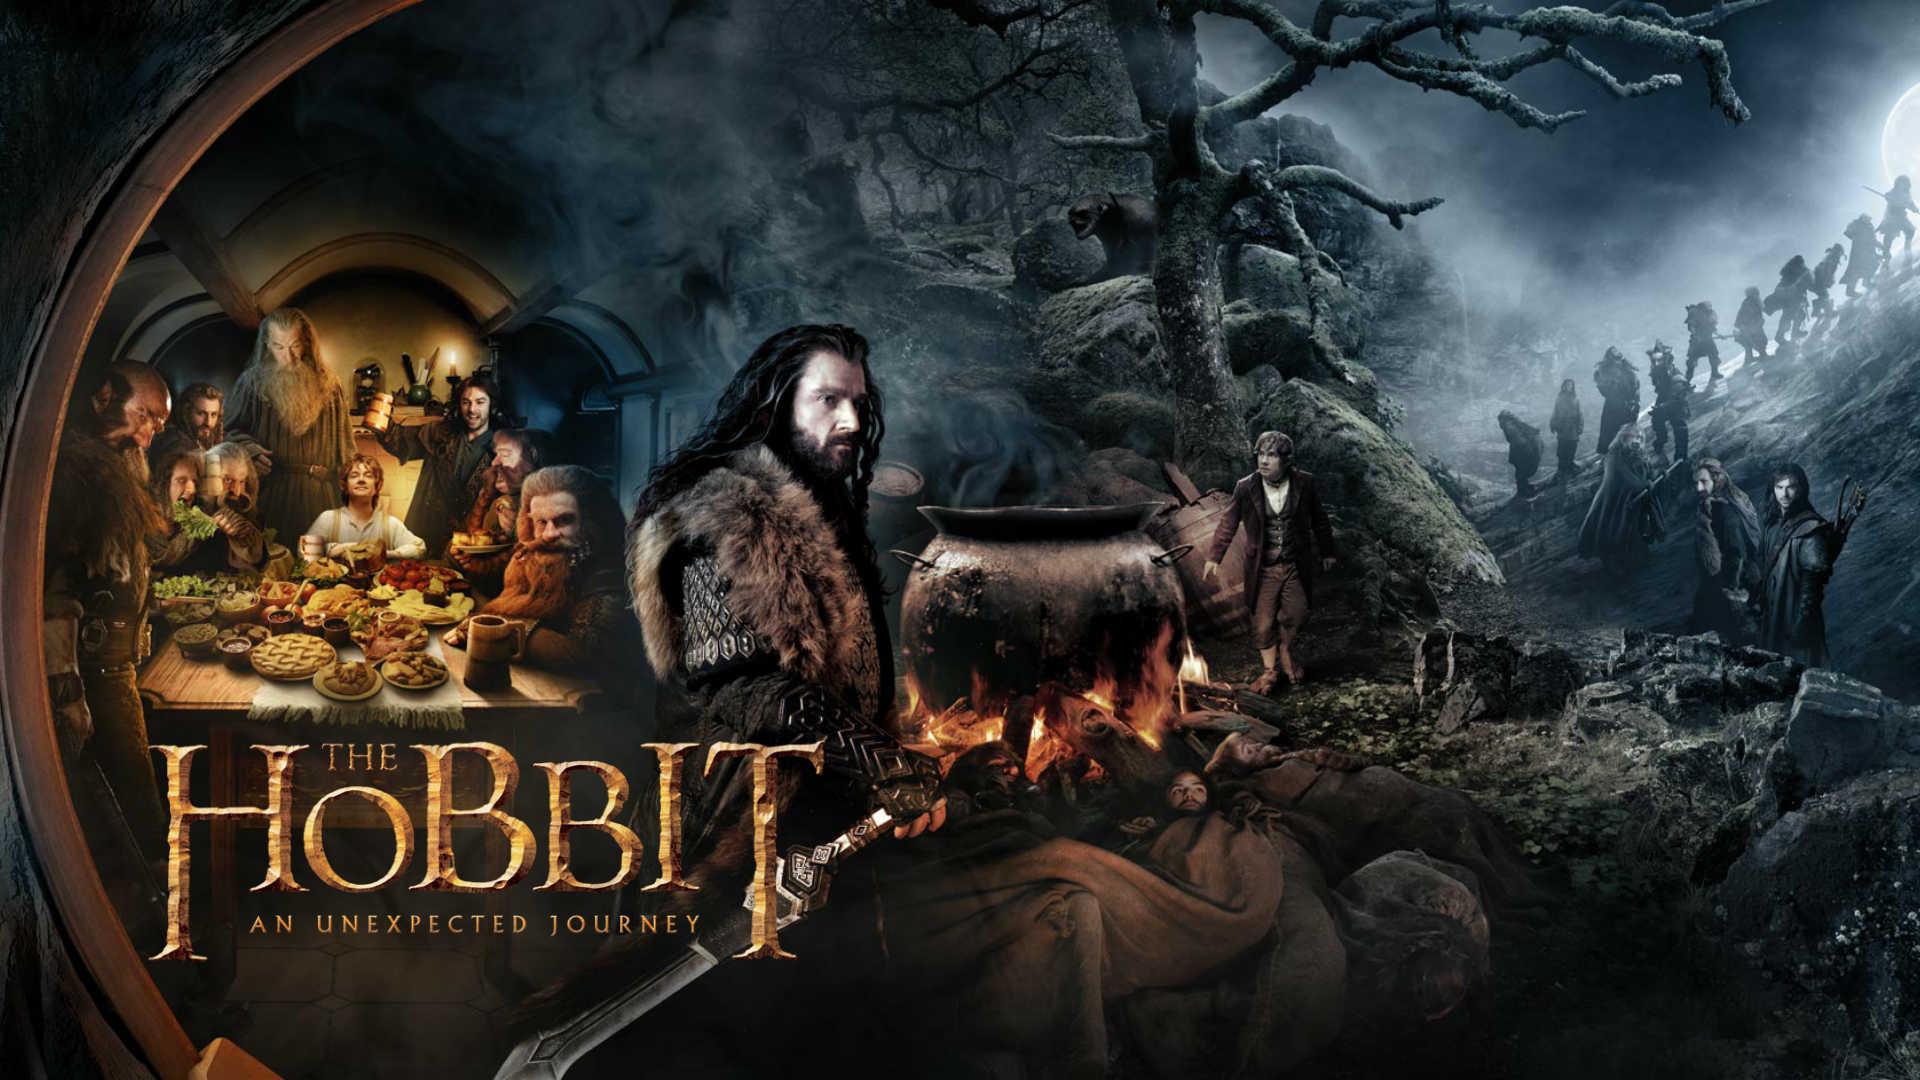 The Hobbit afbeeldingen The Hobbit achtergrond HD achtergrond and 1920x1080